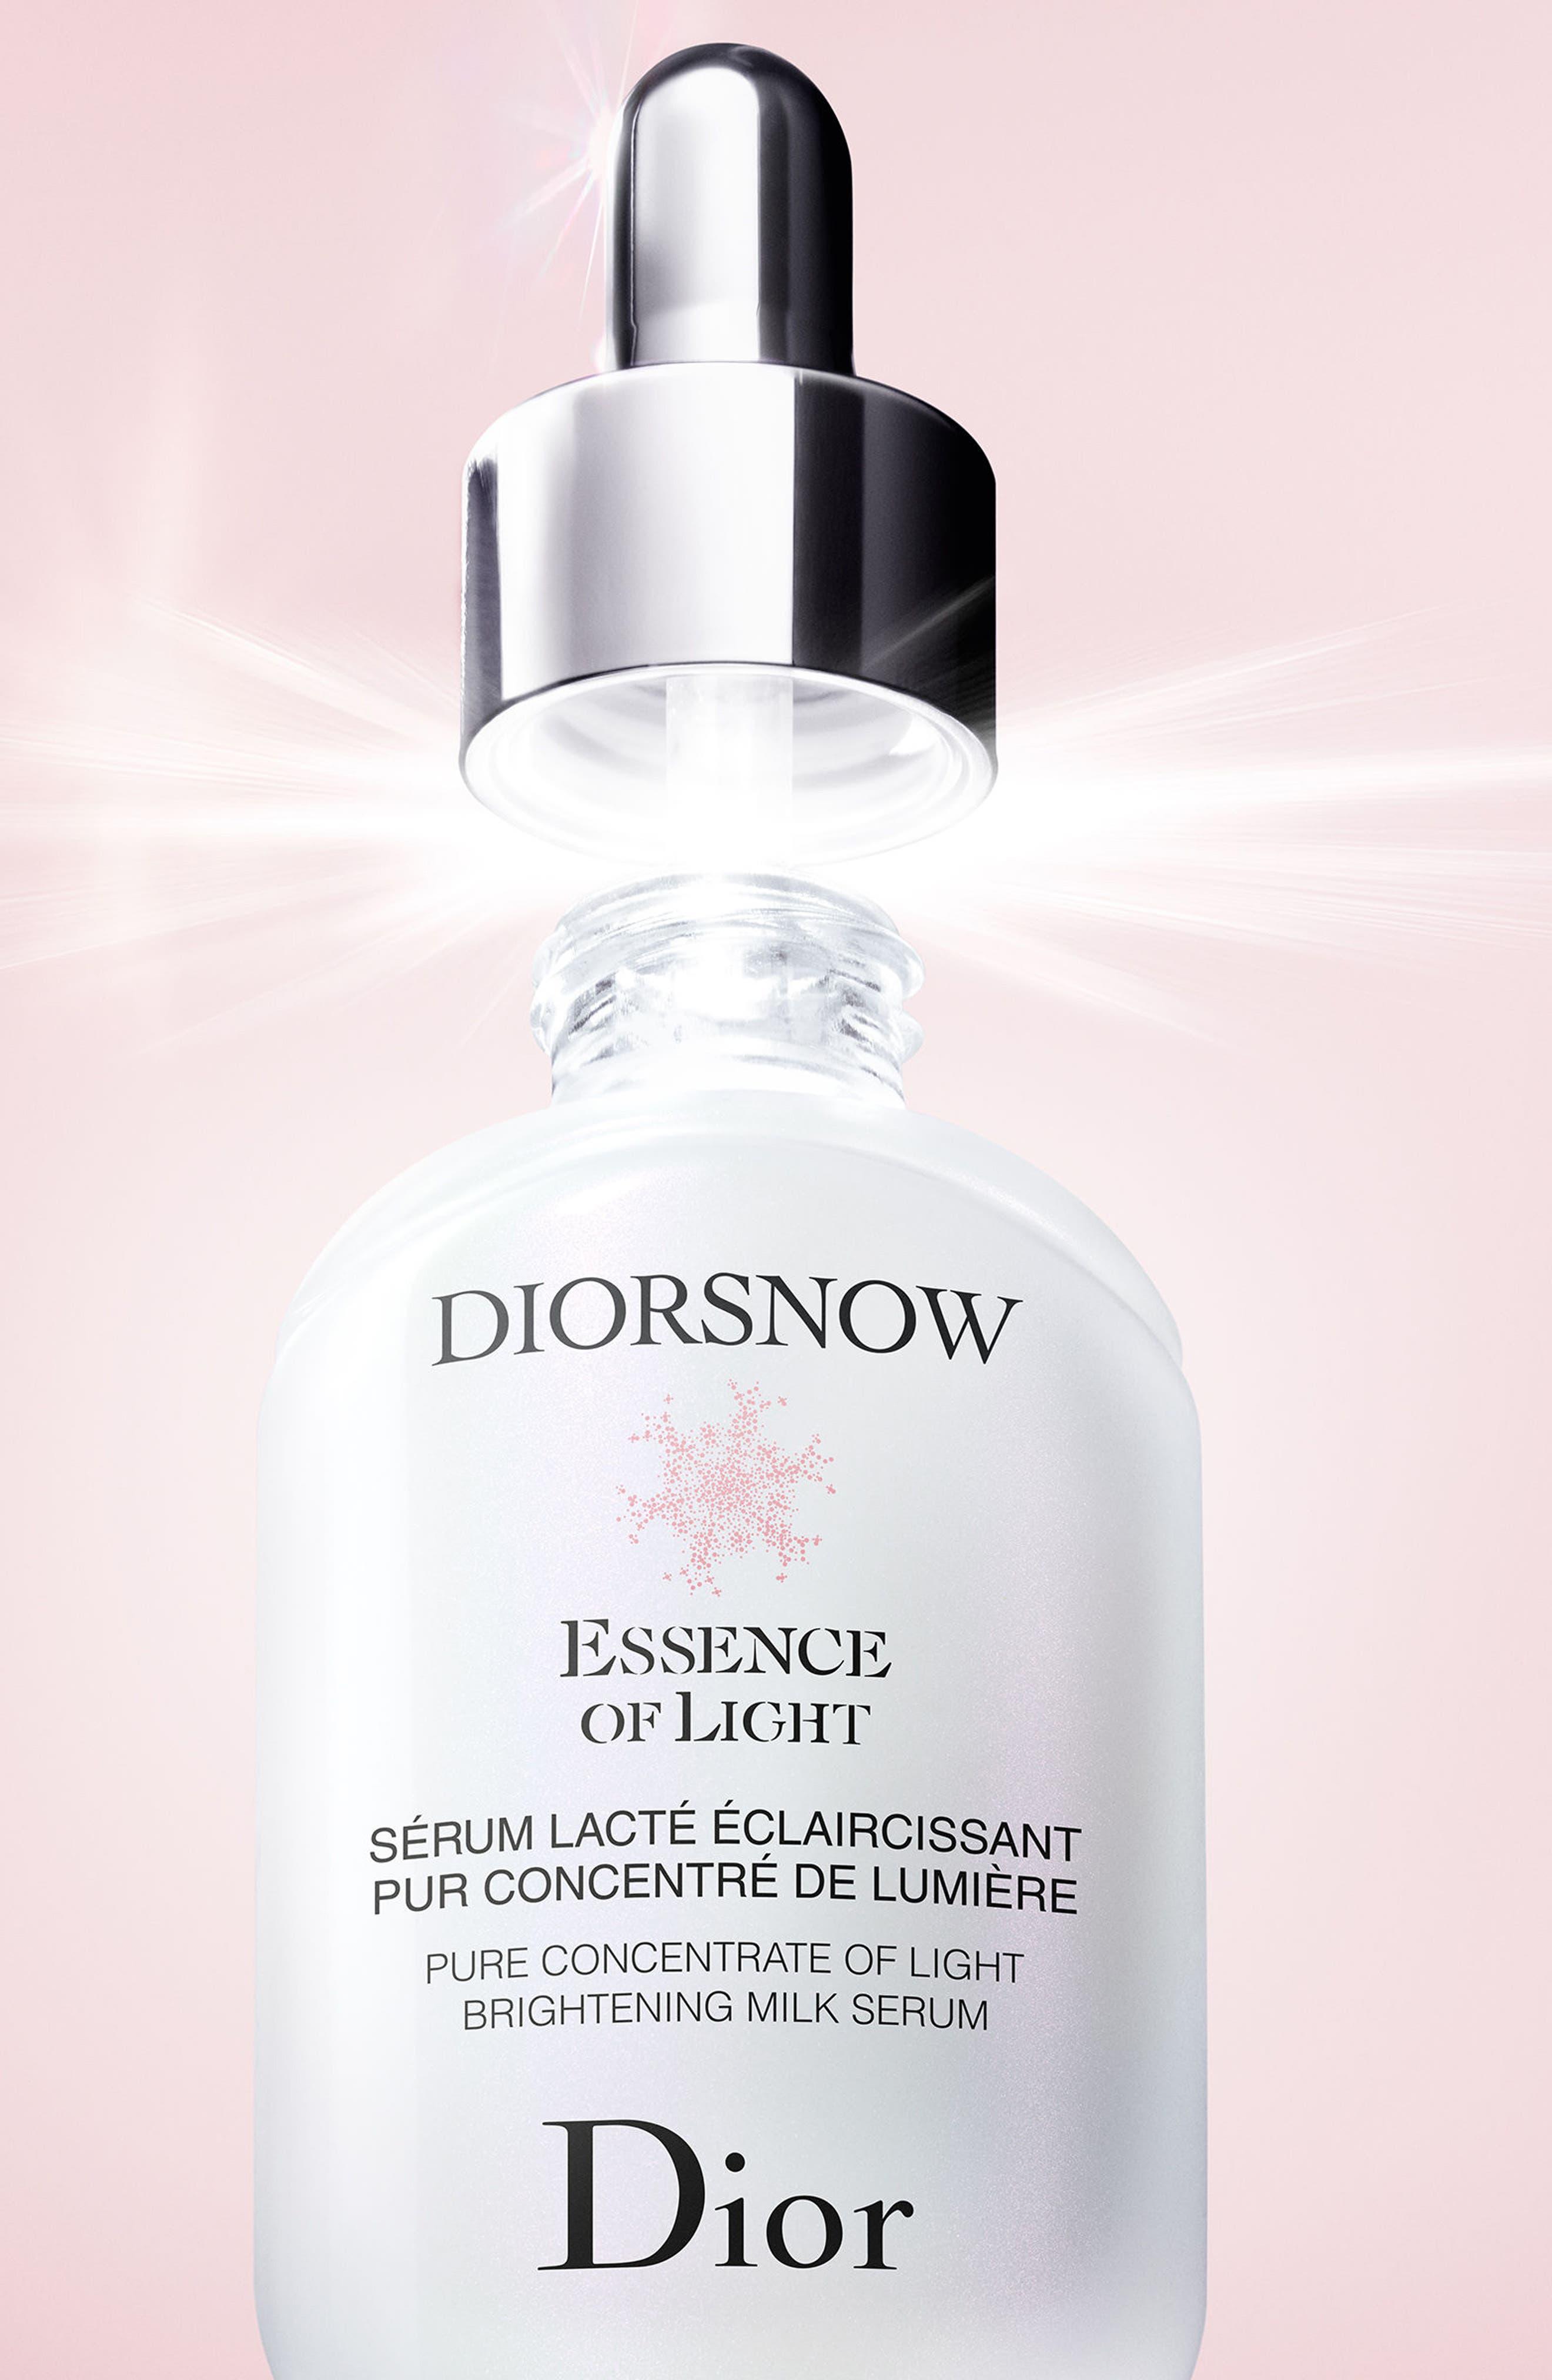 Diorsnow Essence of Light Brightening Milk Serum,                             Alternate thumbnail 4, color,                             NO COLOR